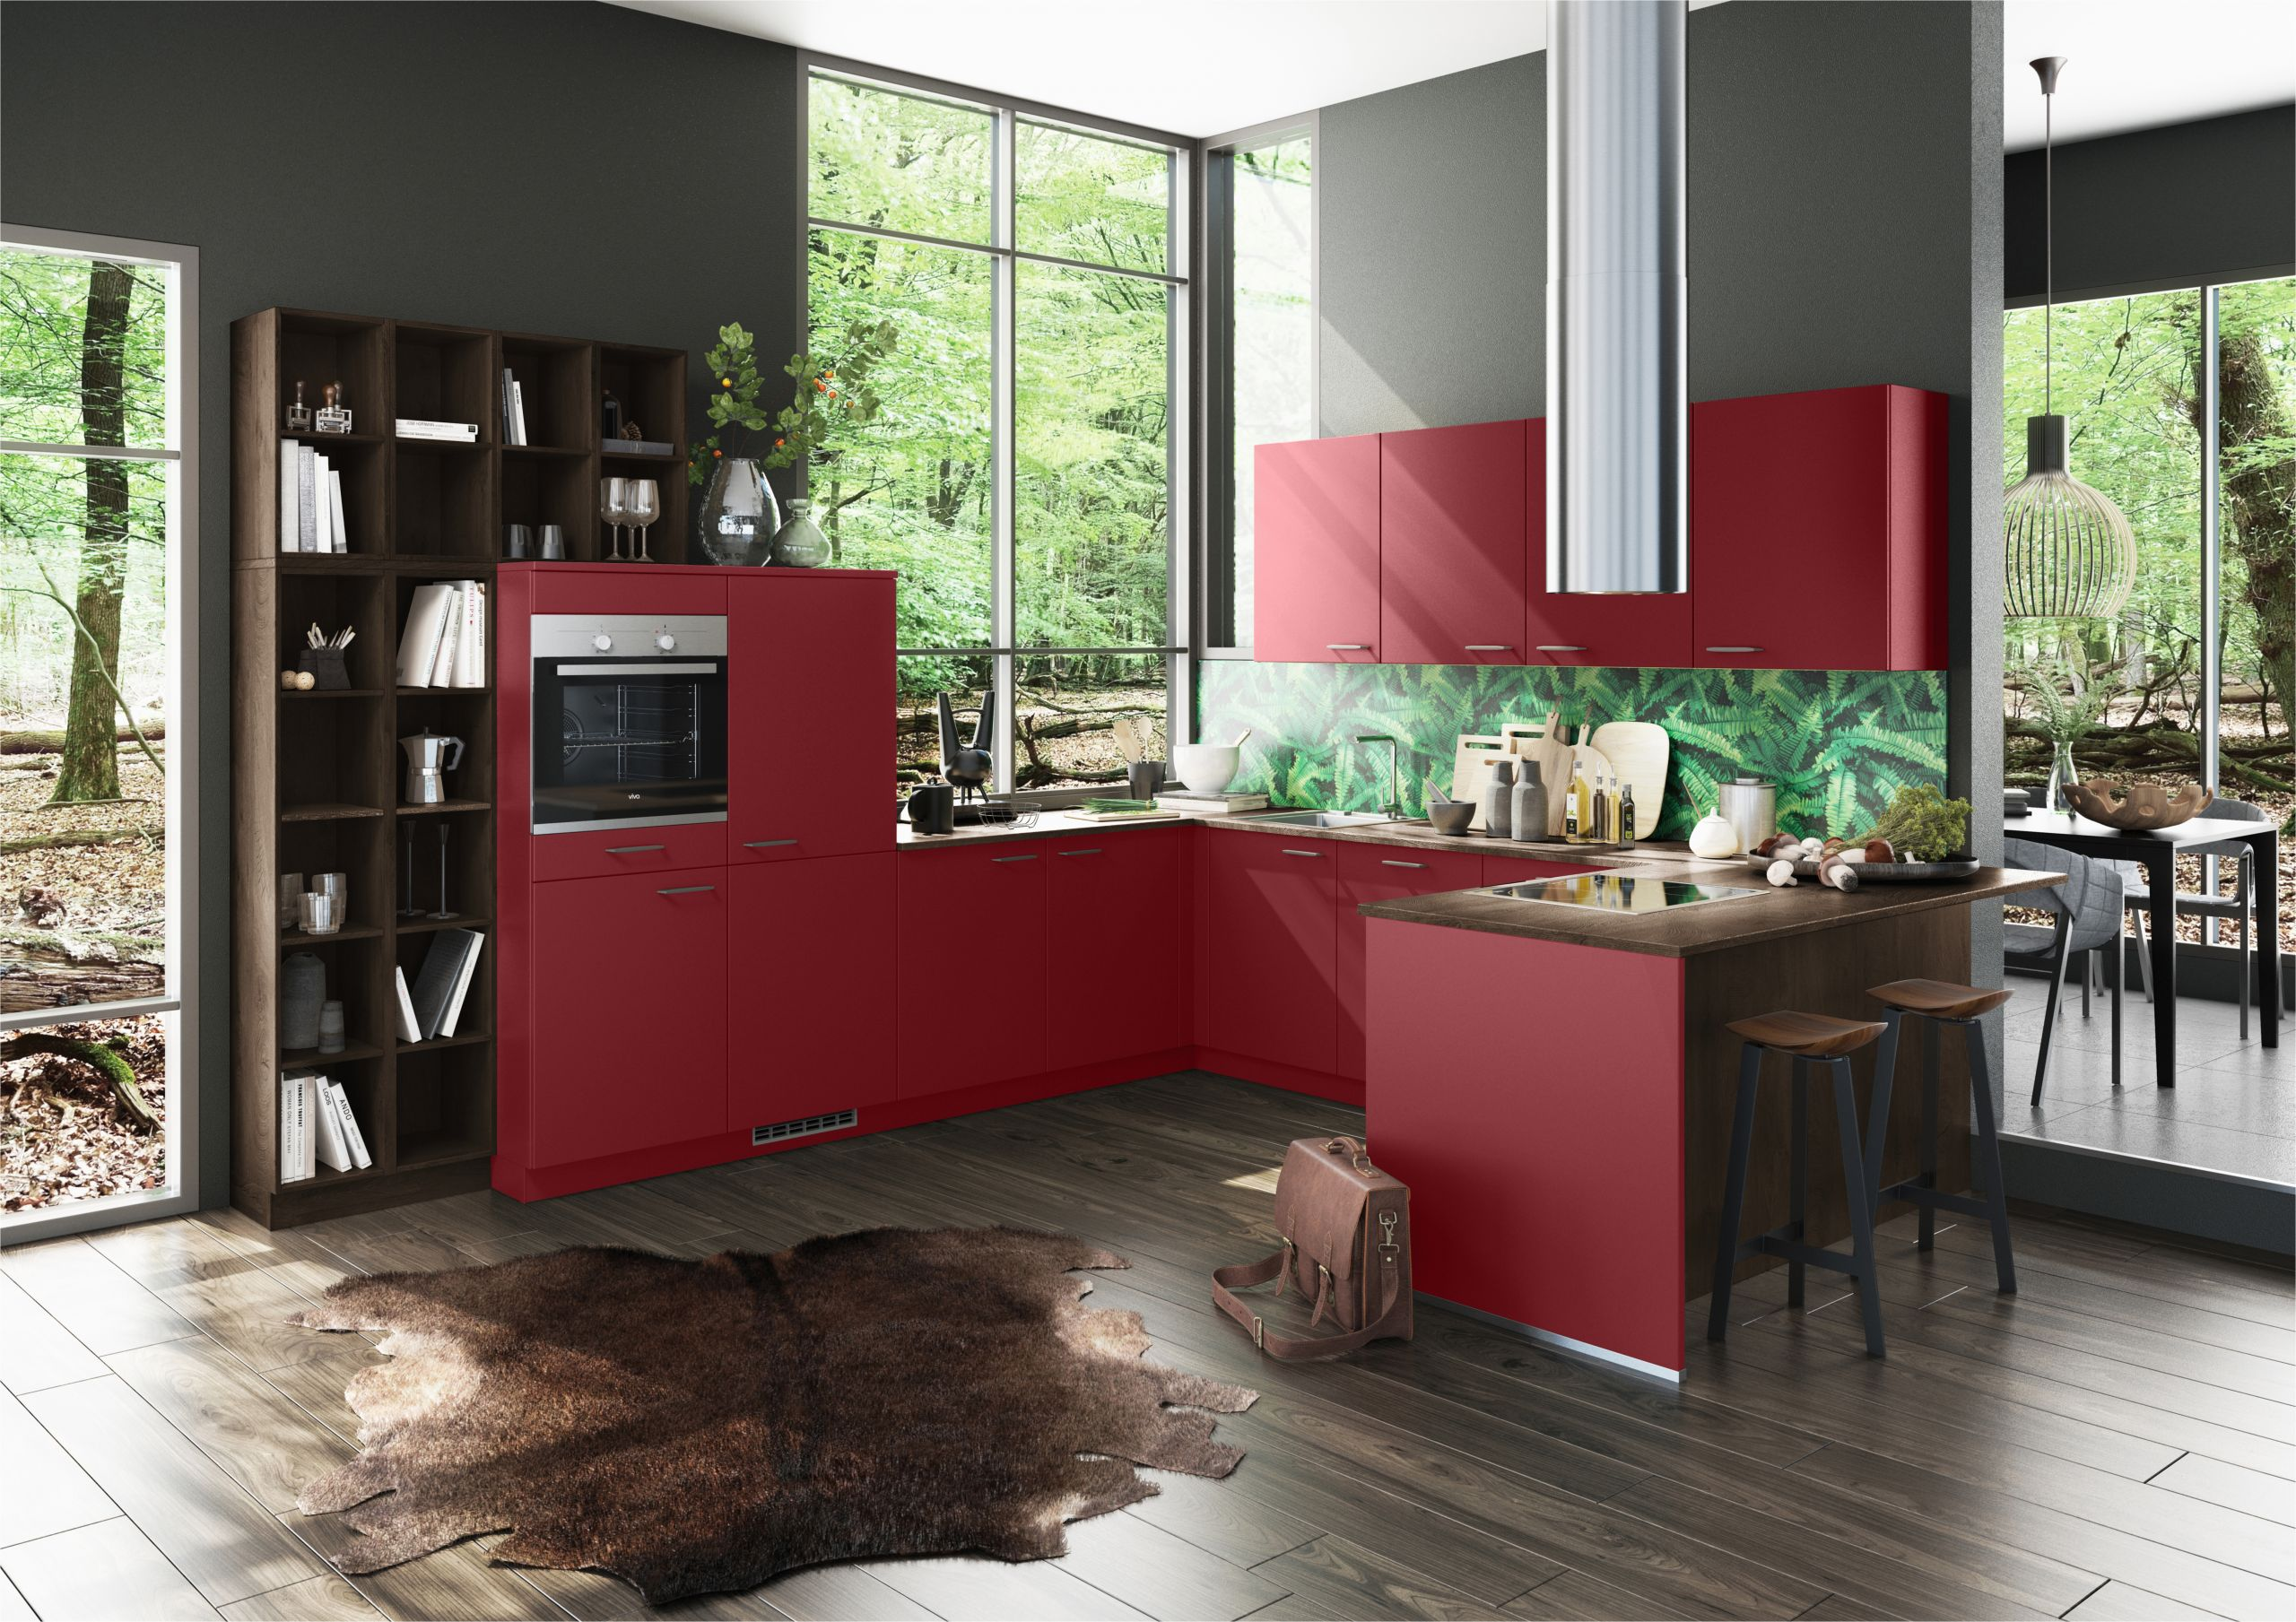 Rot Graue Küche Kuchen Grau Holz